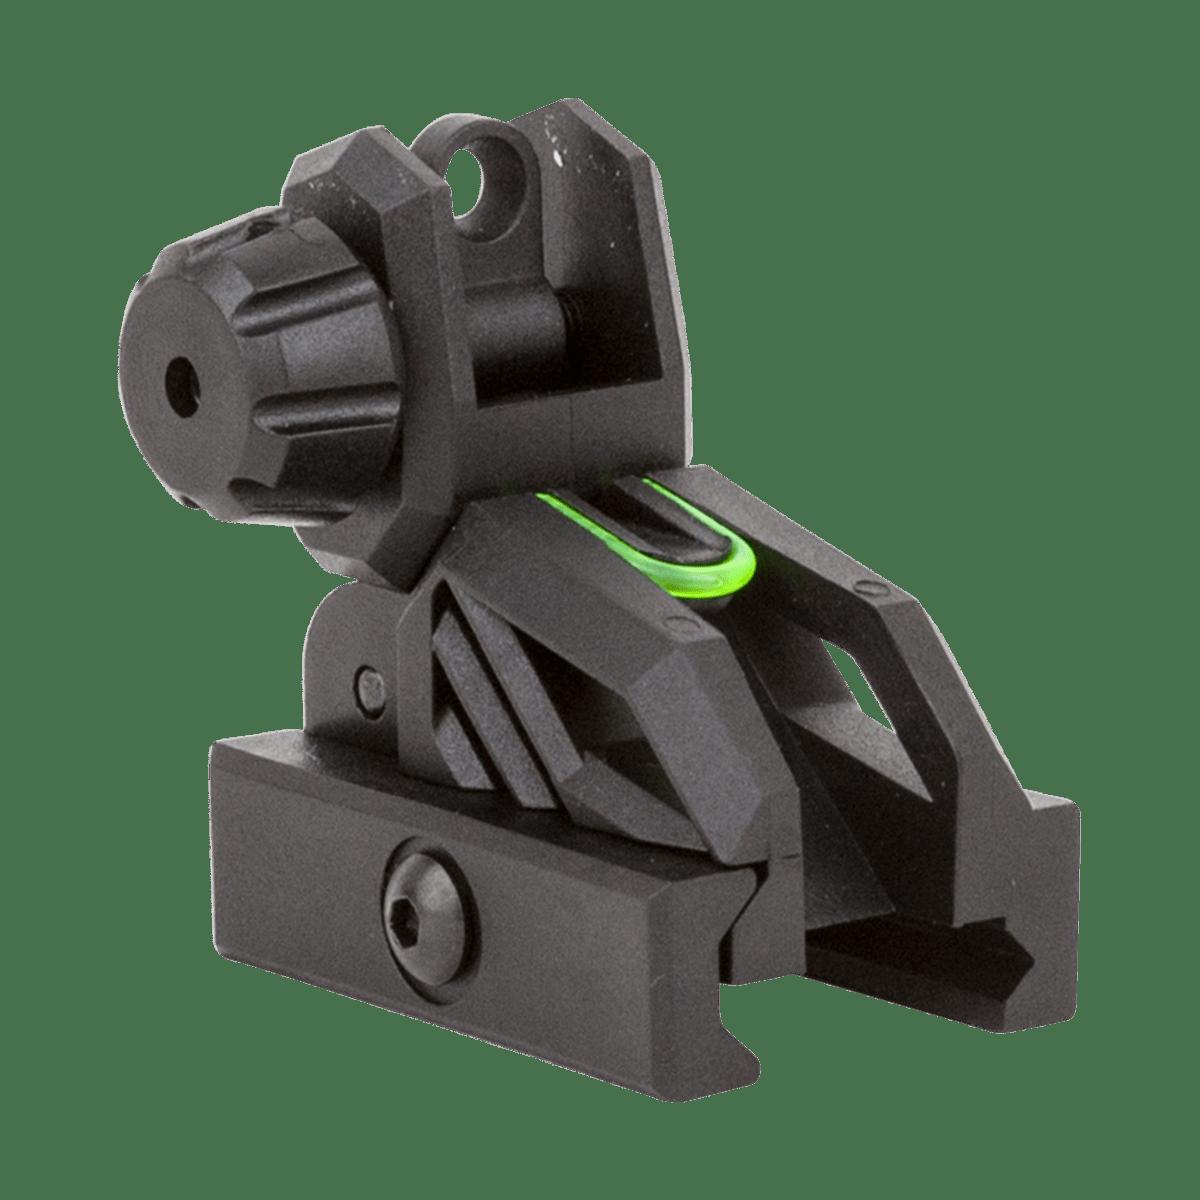 VALKEN FOLDING REAR SIGHT BLACK/NEON product image